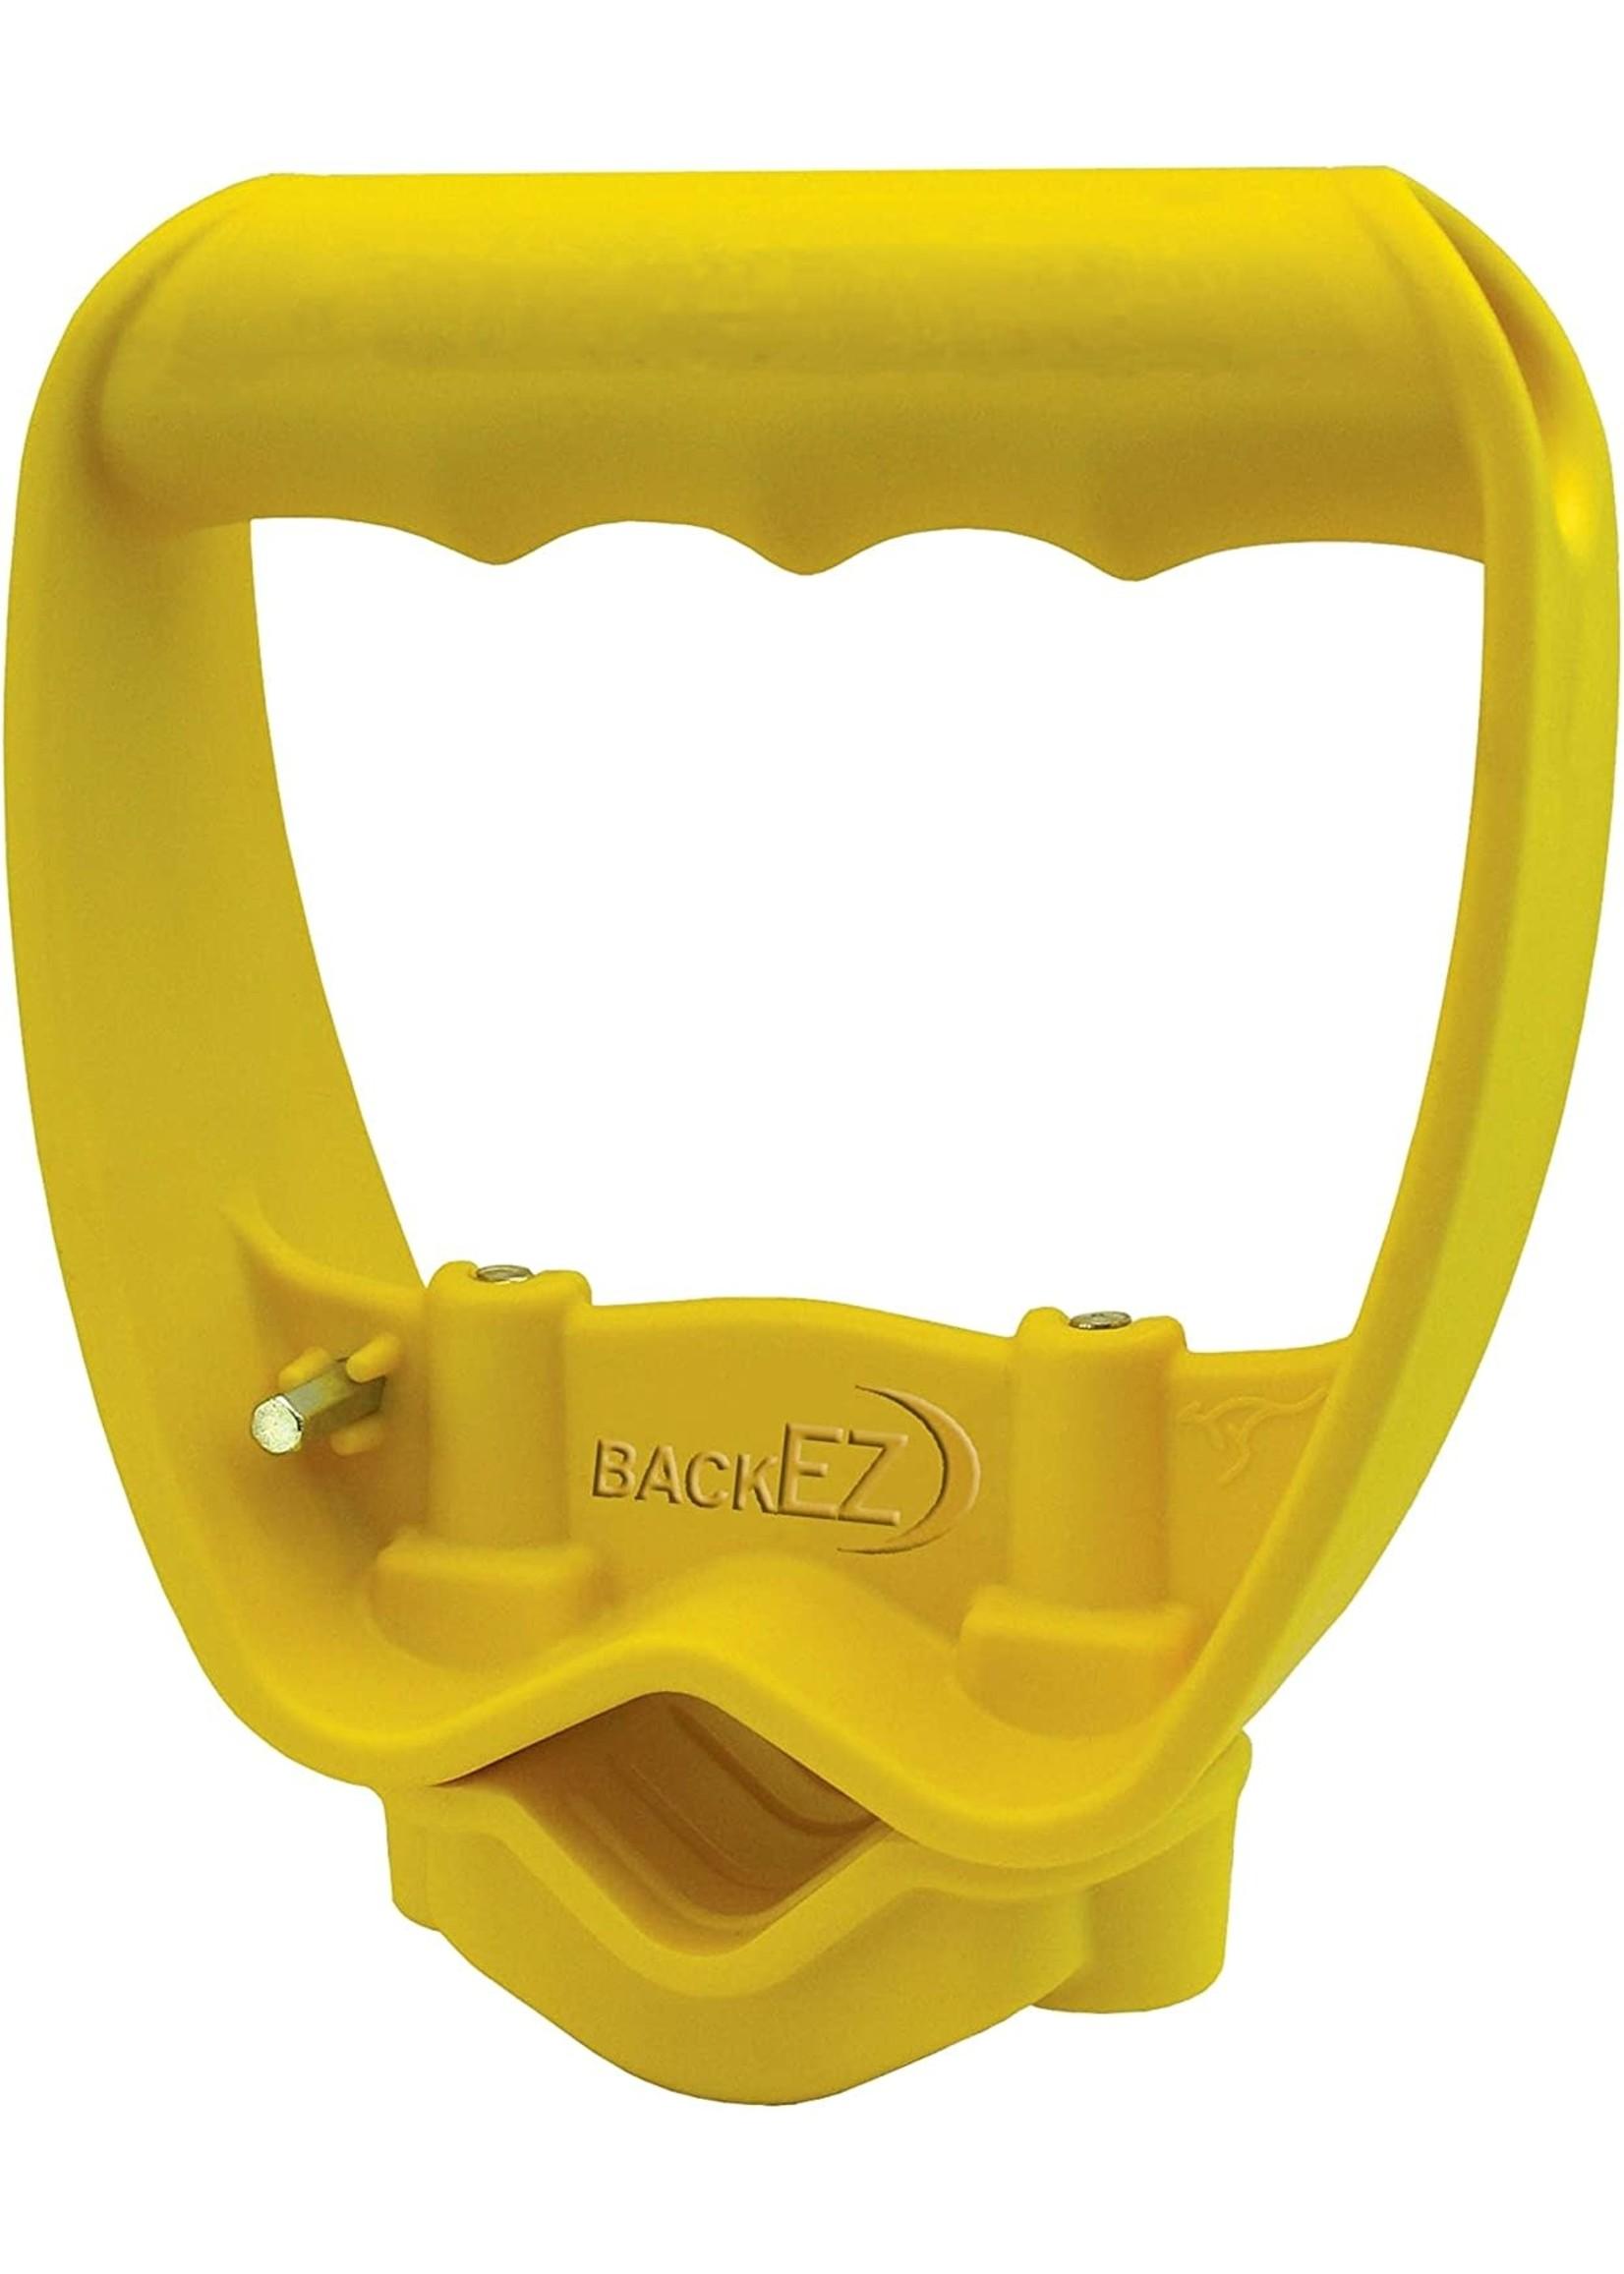 Hardwire Tackle Back Ez Dip Net Power Handle